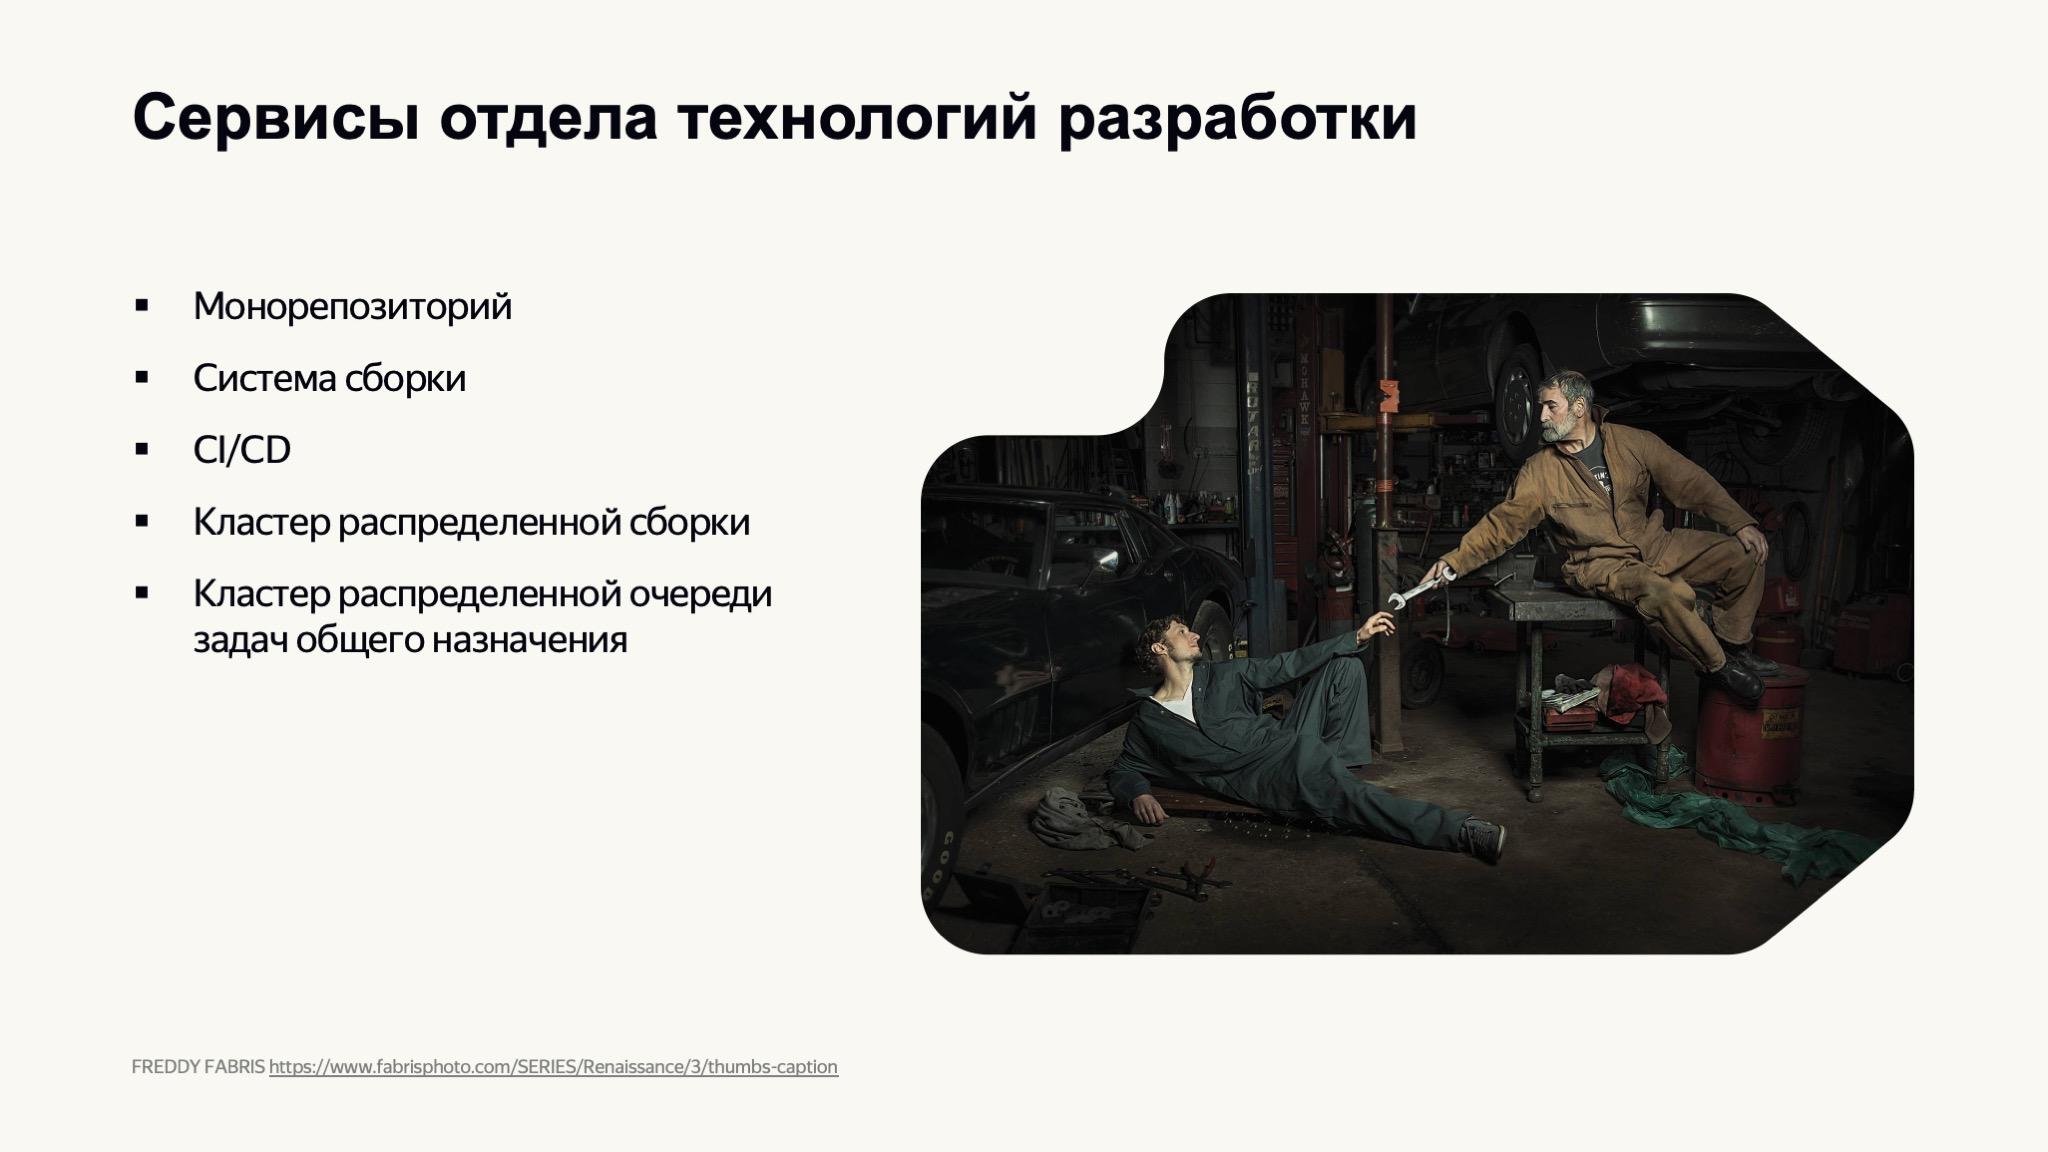 Ссылка со слайда: https://www.fabrisphoto.com/SERIES/Renaissance/3/thumbs-caption